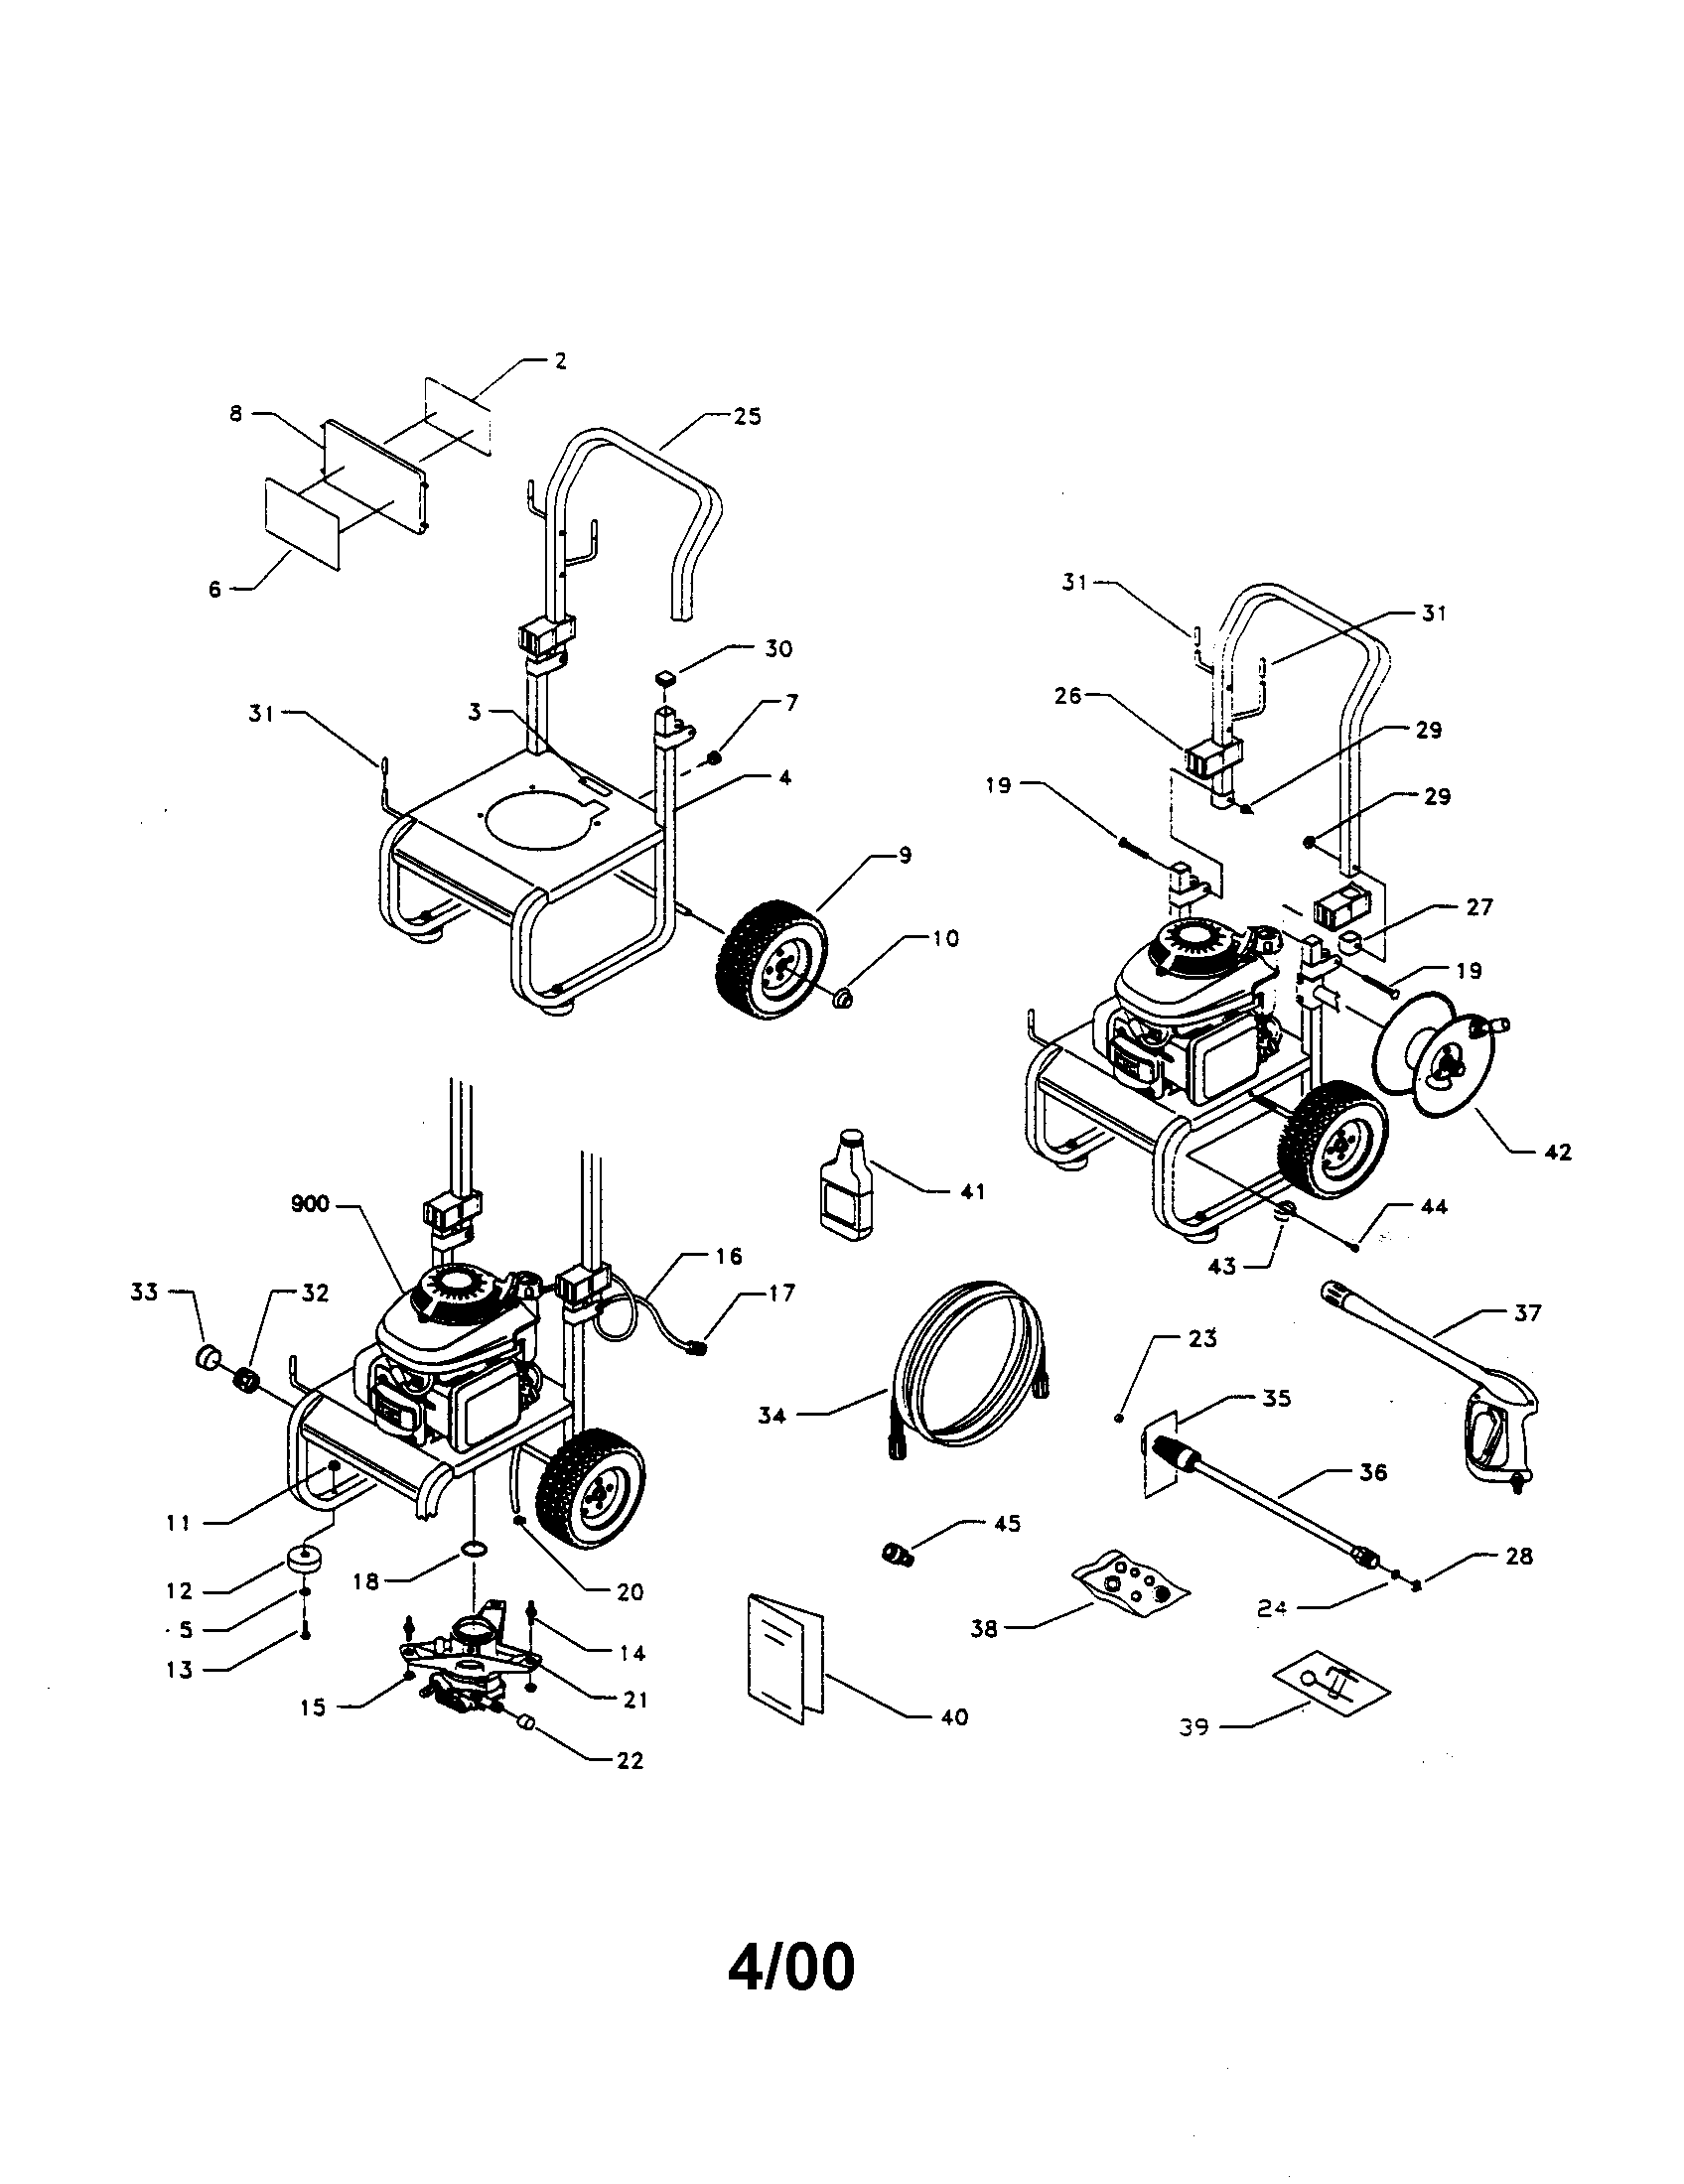 medium resolution of pressure washer motor diagram motor repalcement parts and diagram wiring diagram week